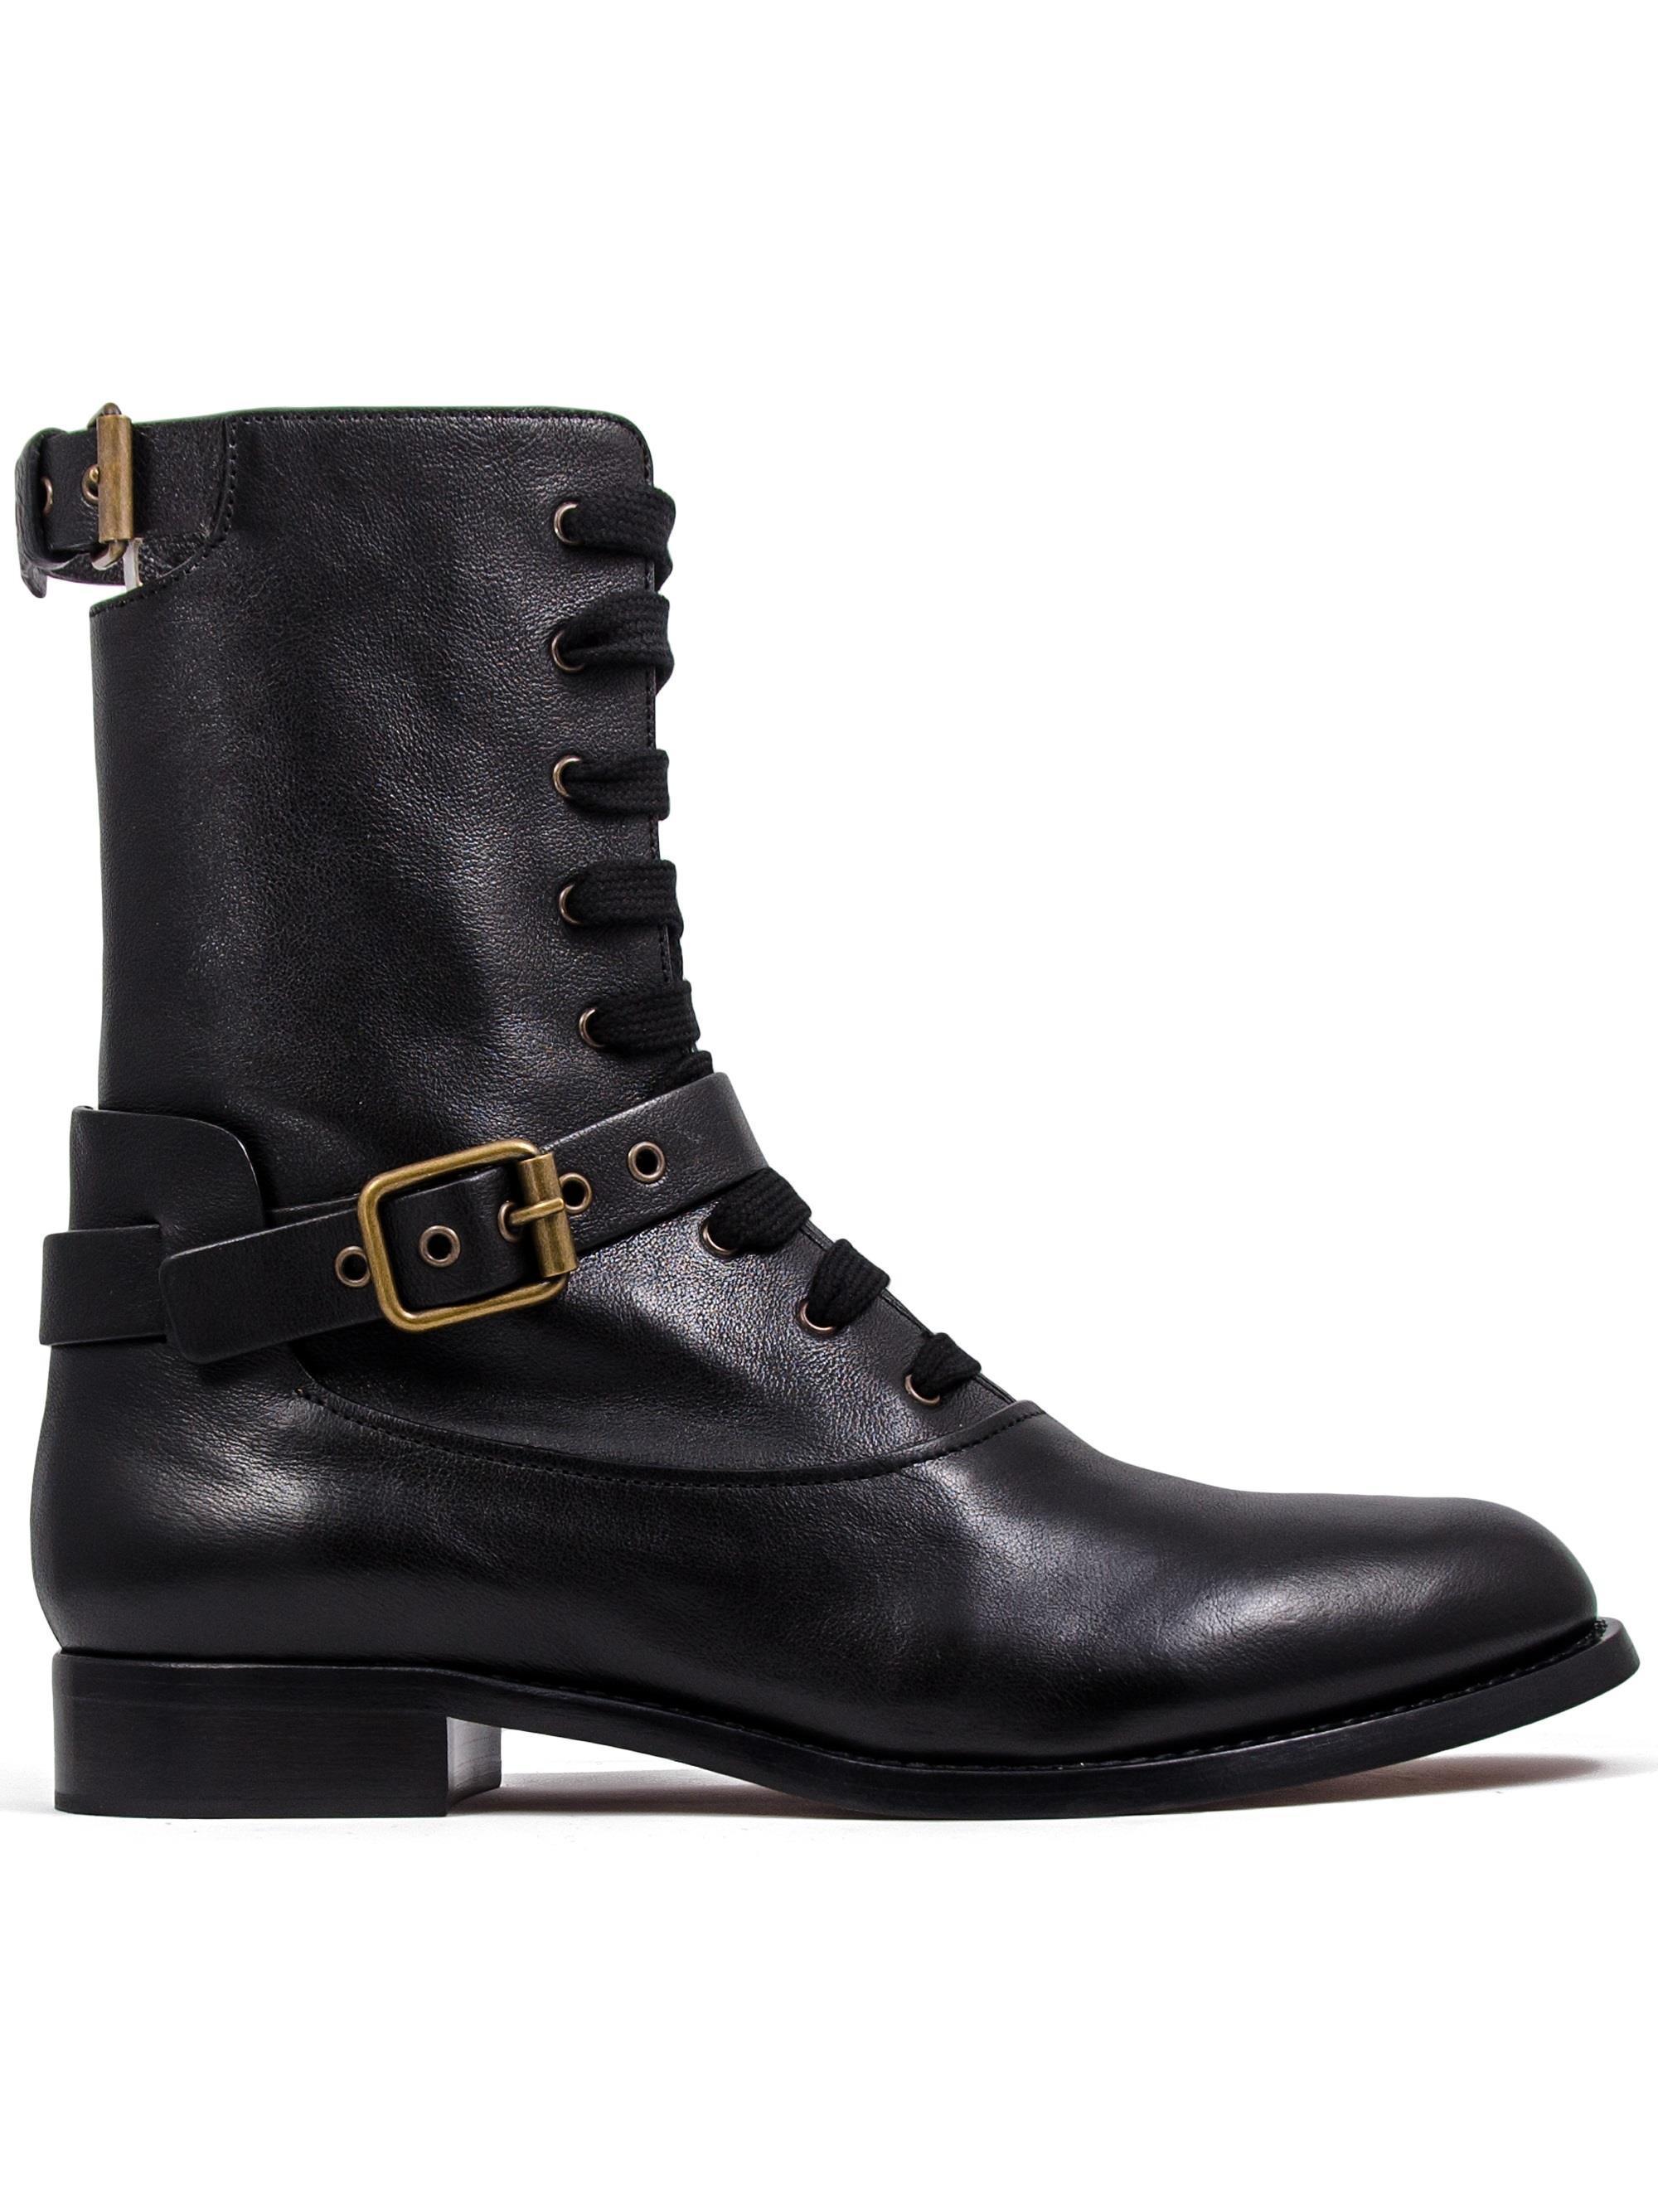 Chloe Lauren Shoes Sale